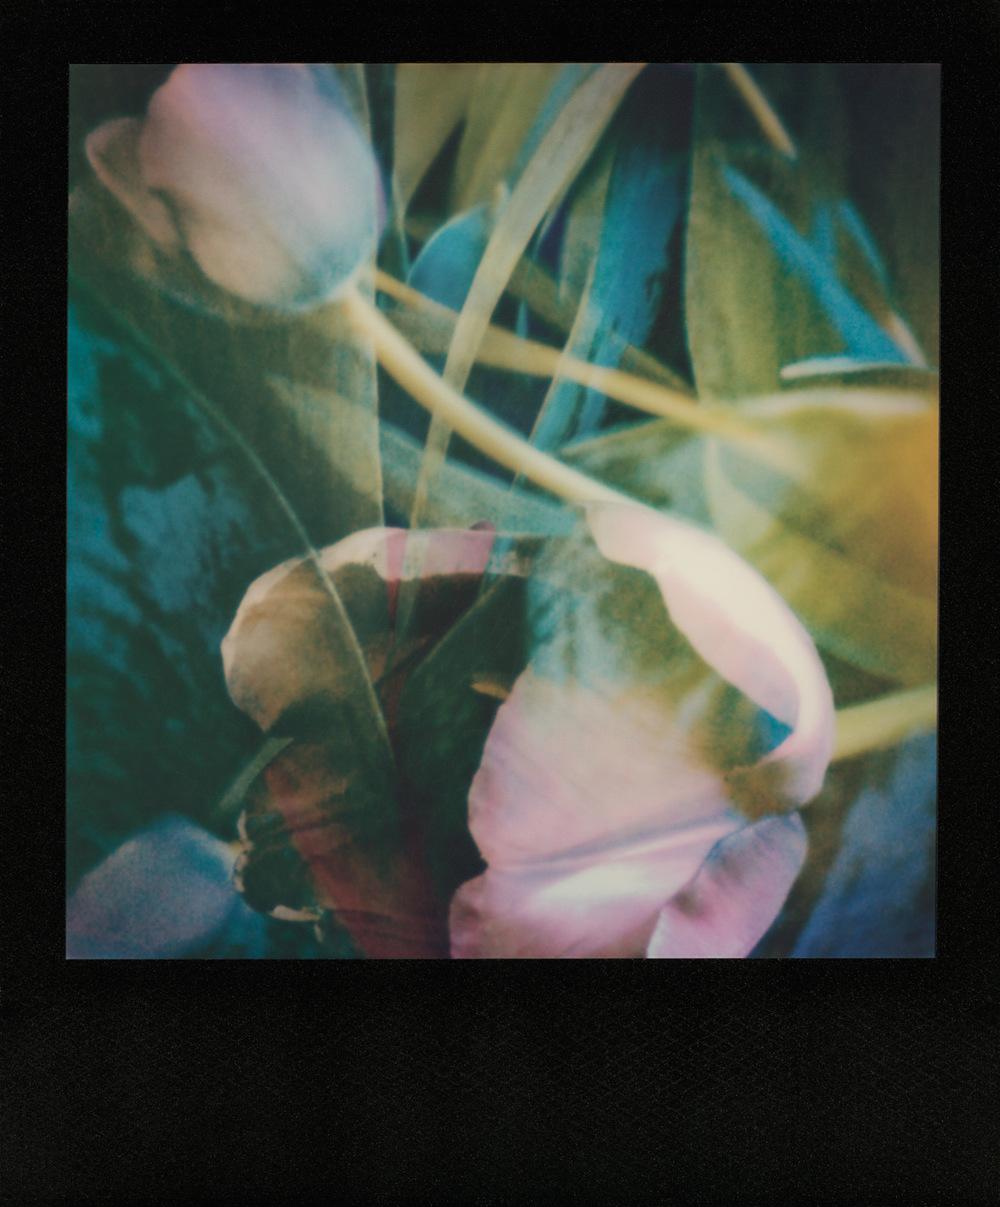 pola_lavender_tulip_1500px.jpg